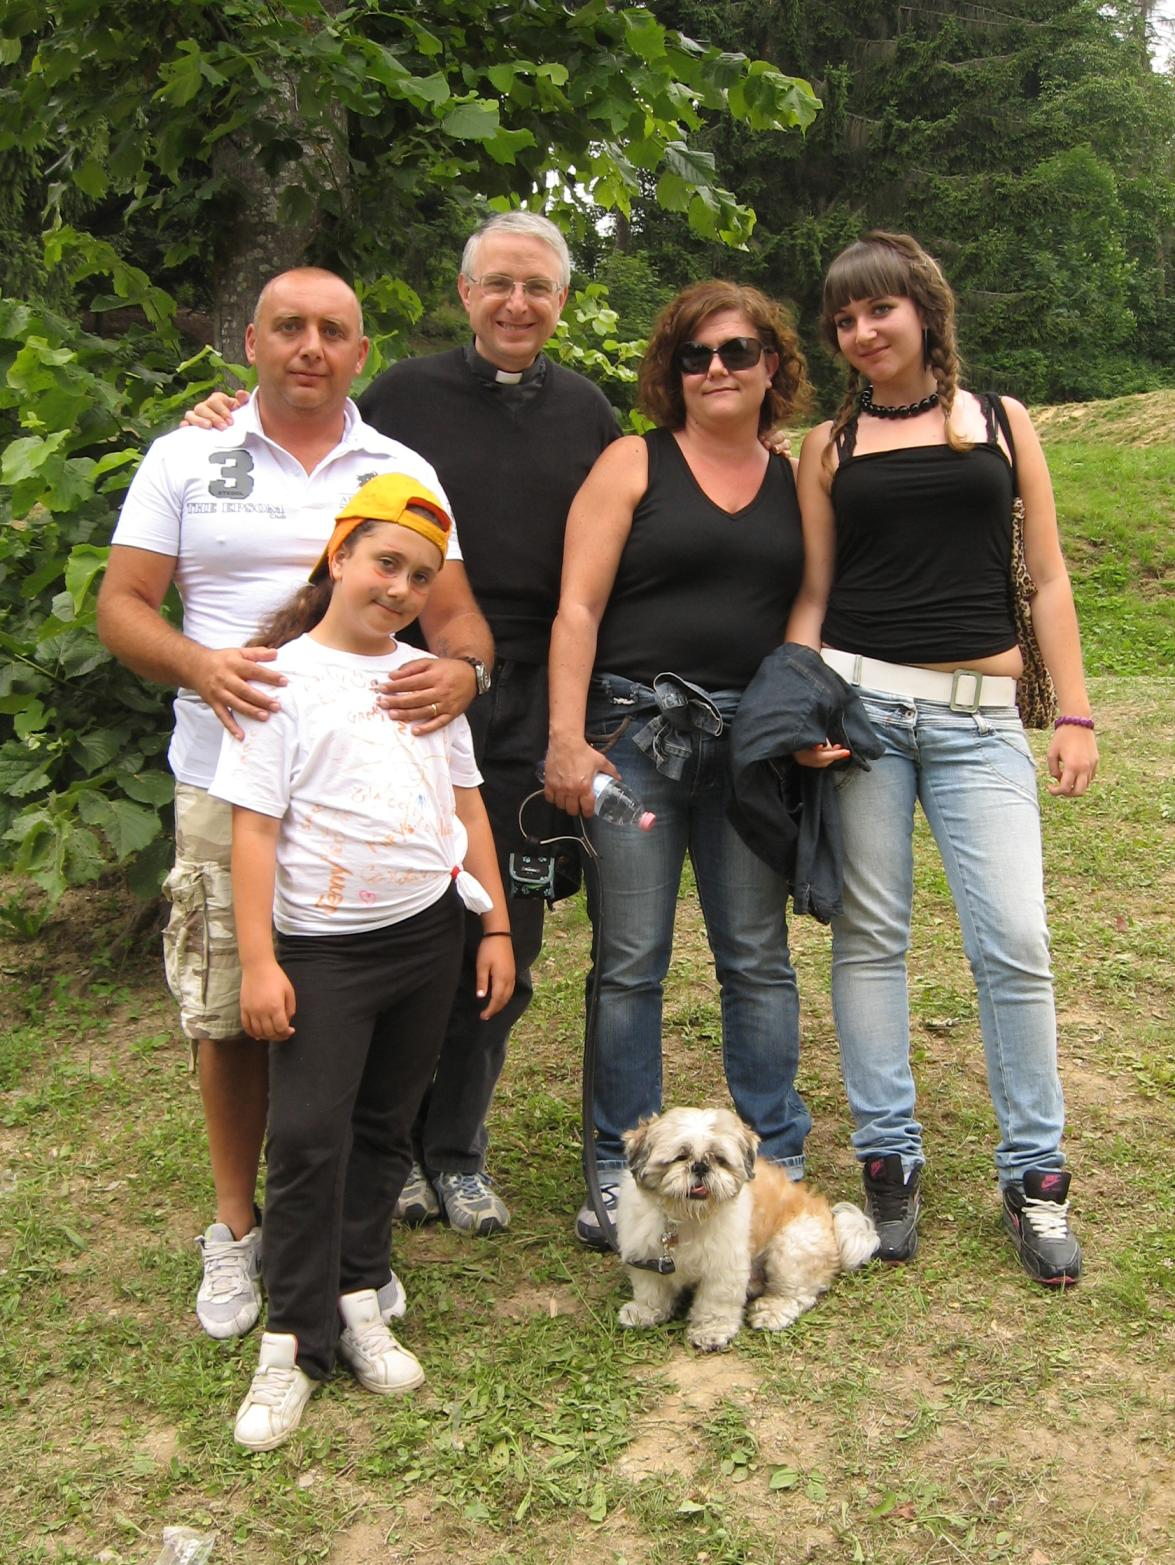 Campo_San_Giacomo_famiglie-2009-07-12--14.29.58